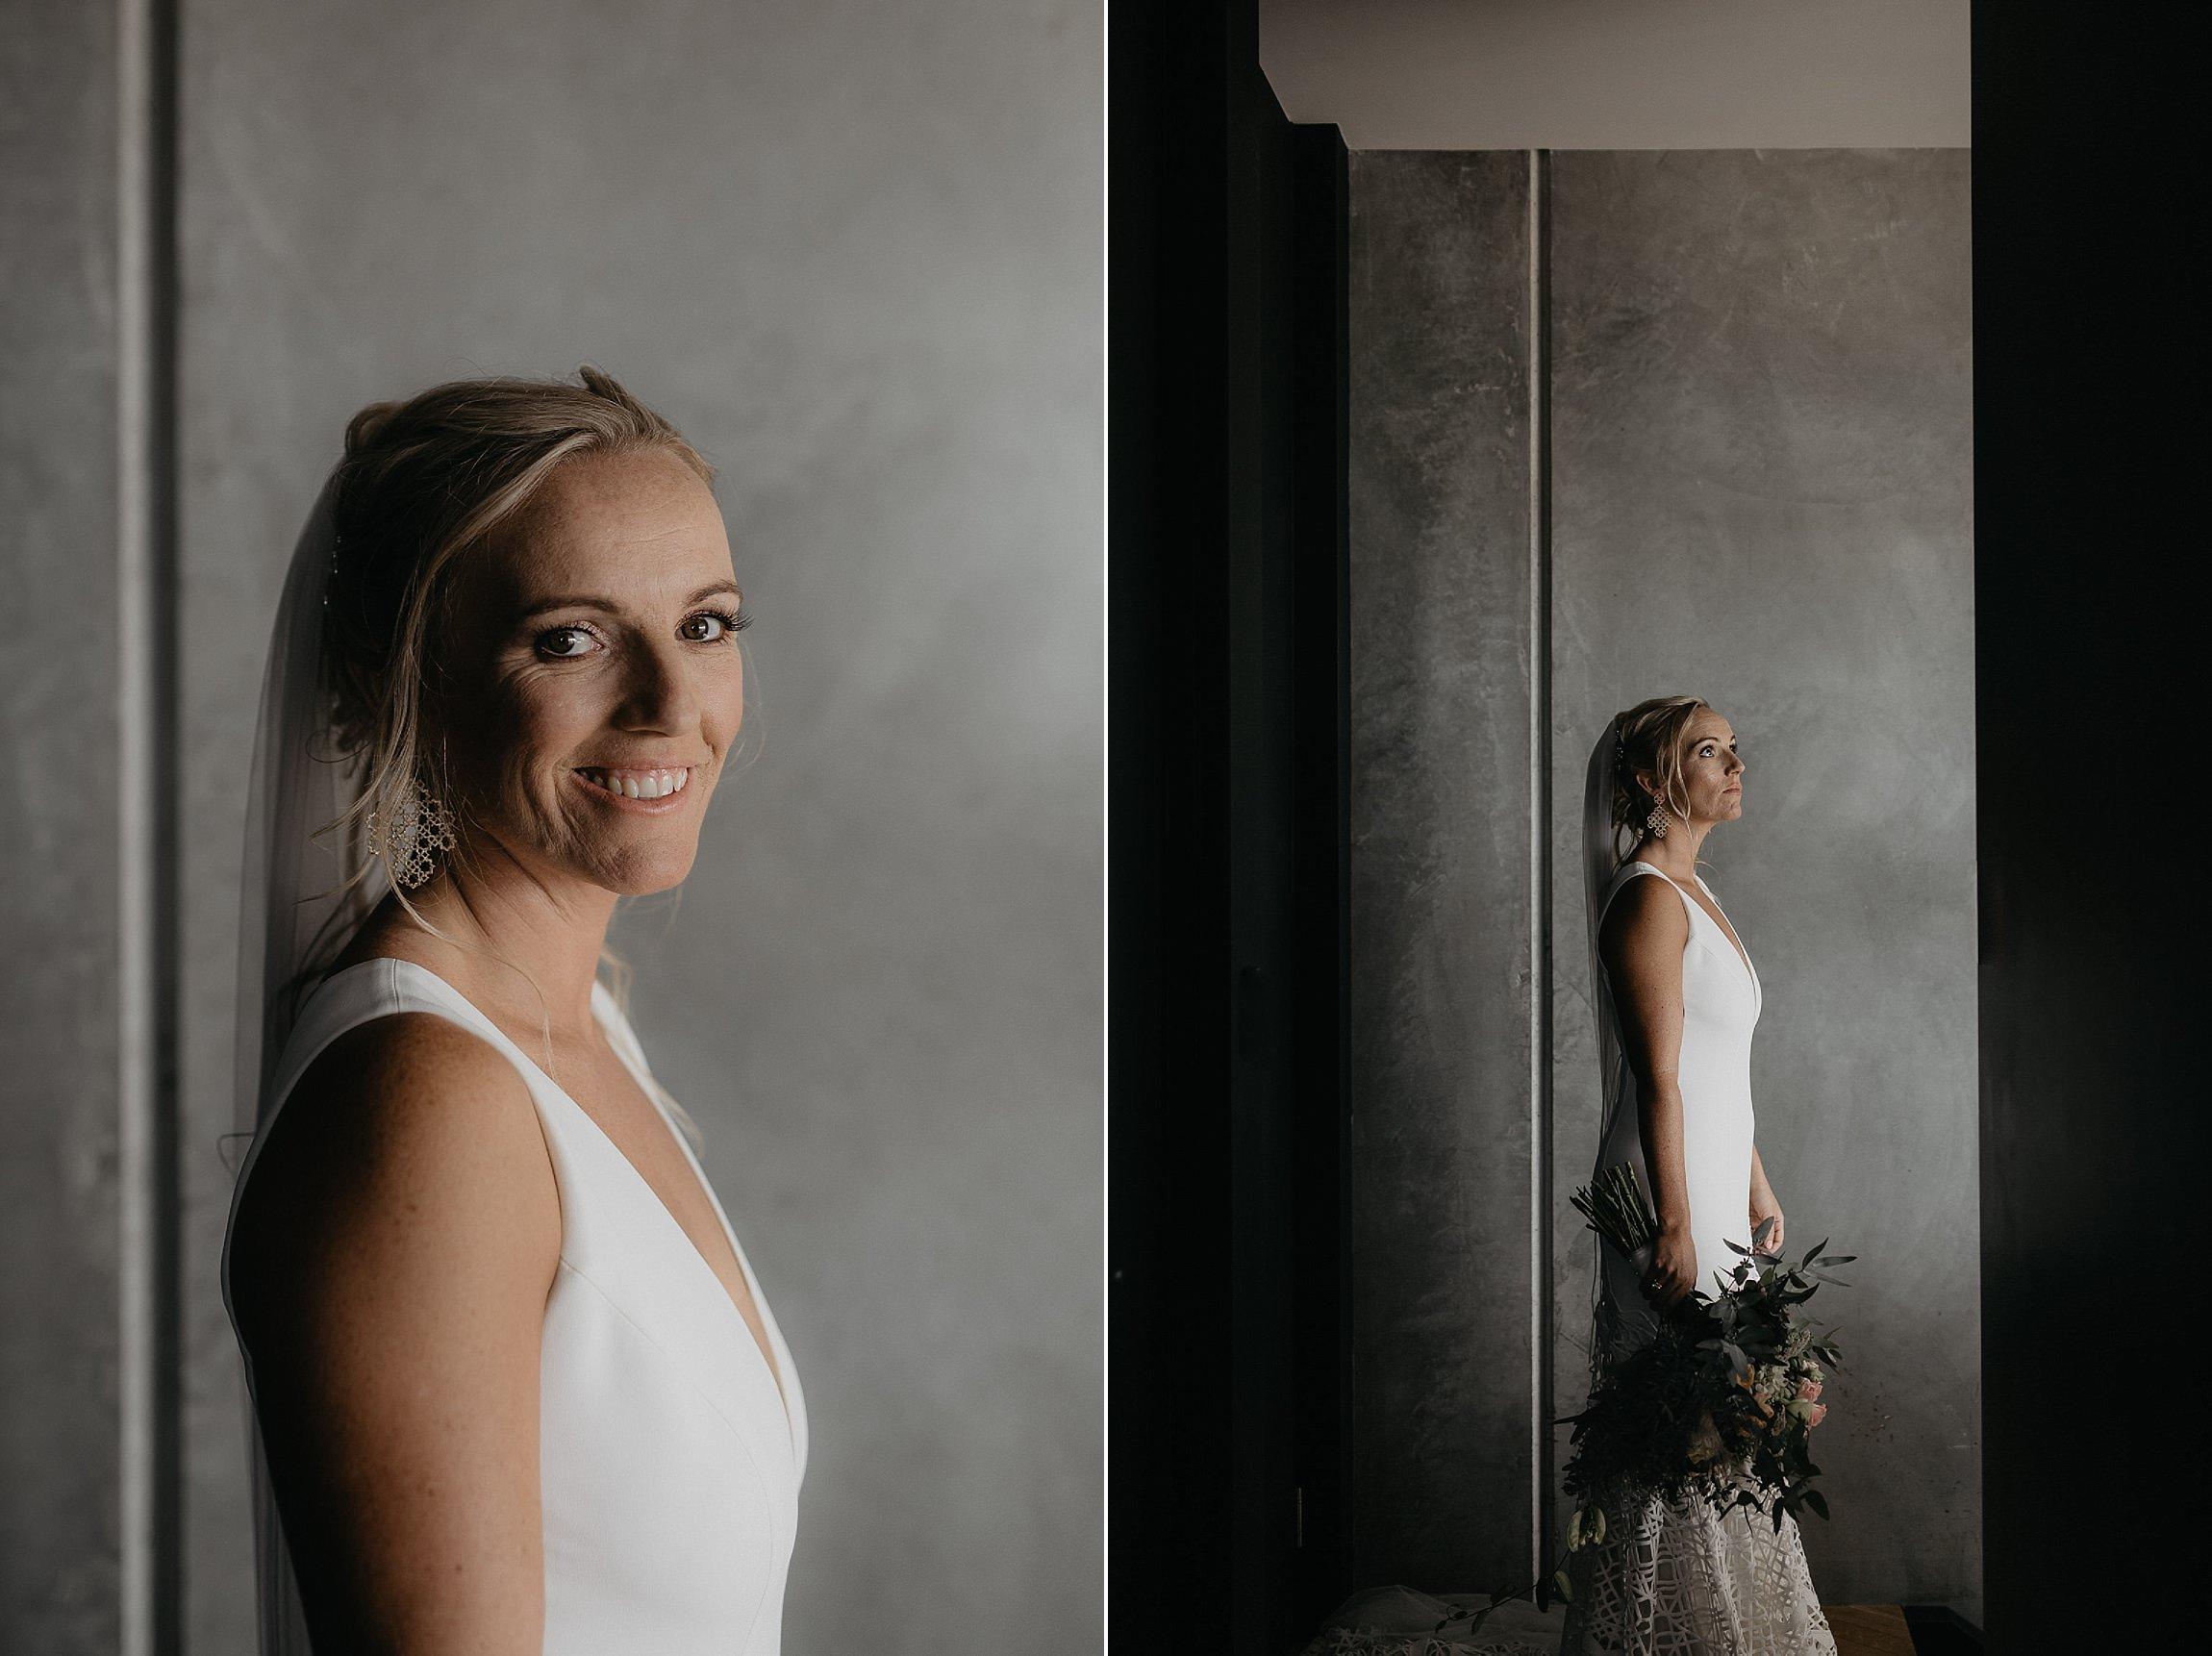 oldforestschool-wedding-blog-21.jpg